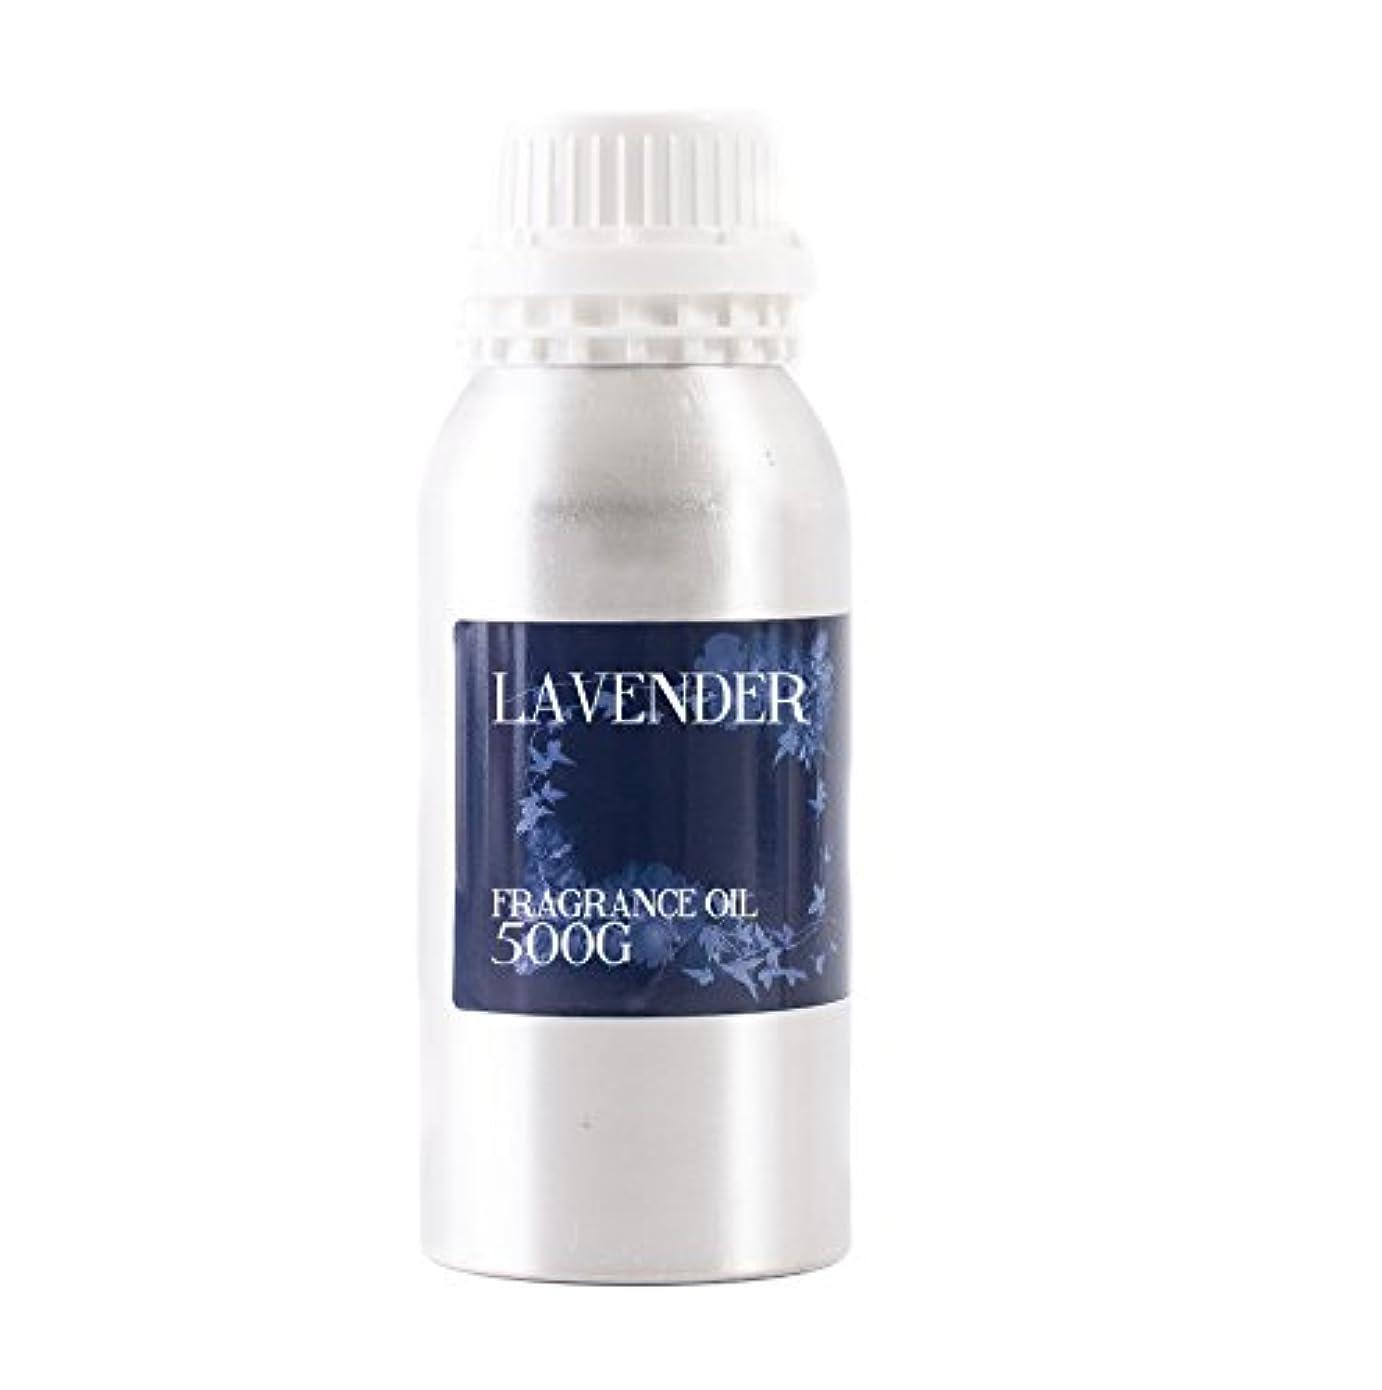 Mystic Moments | Lavender Fragrance Oil - 500g